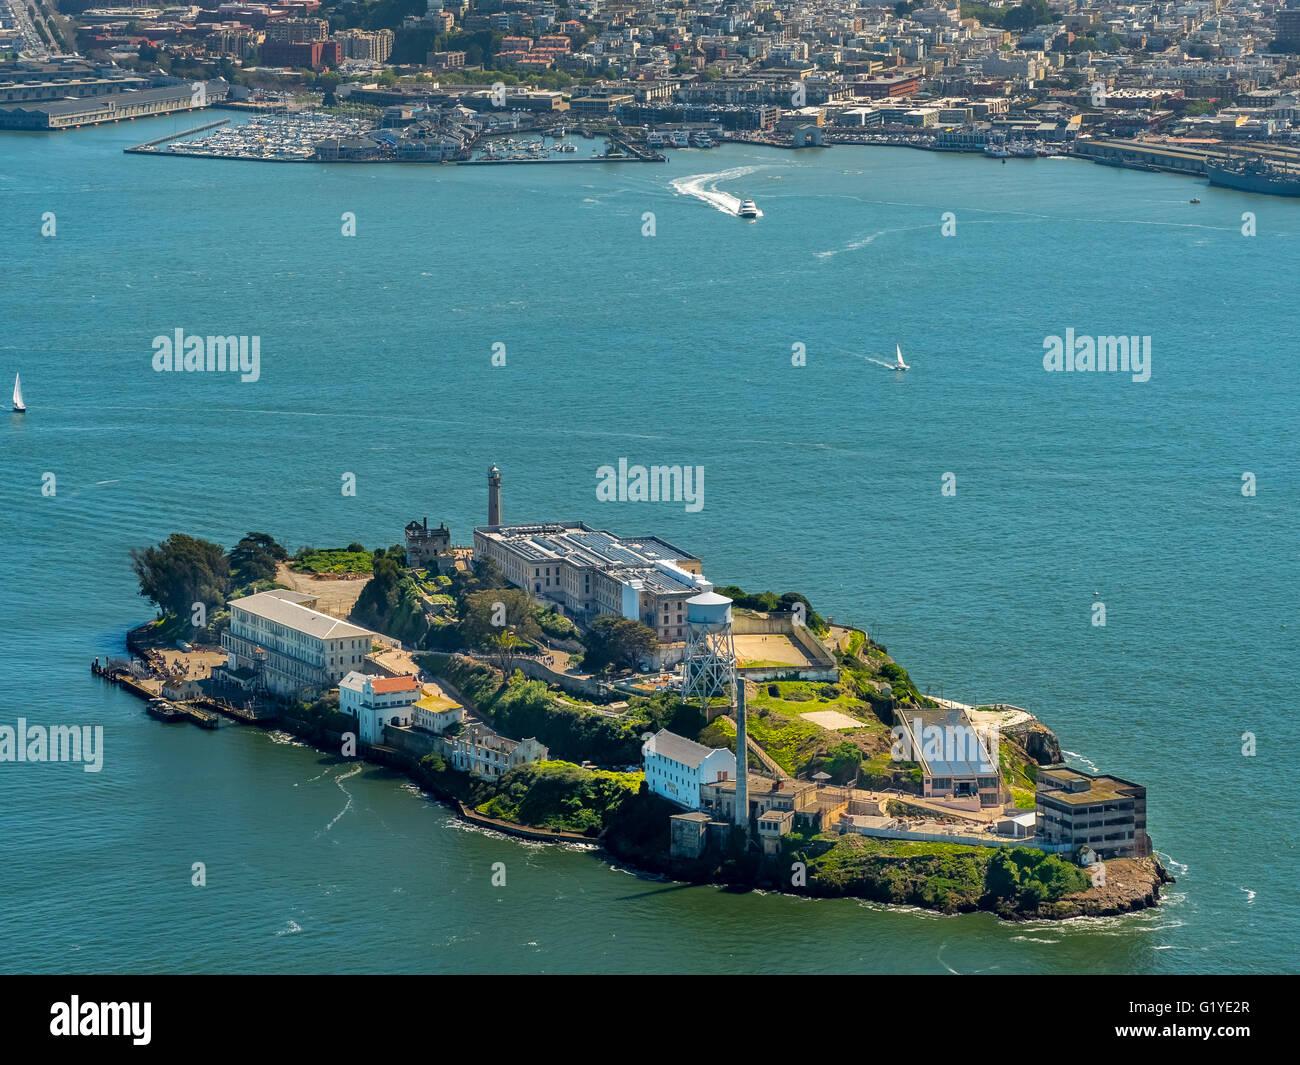 Vista aérea, Alcatraz, prisión de Alcatraz Island con faro, San Francisco, San Francisco Bay Area, USA, Imagen De Stock